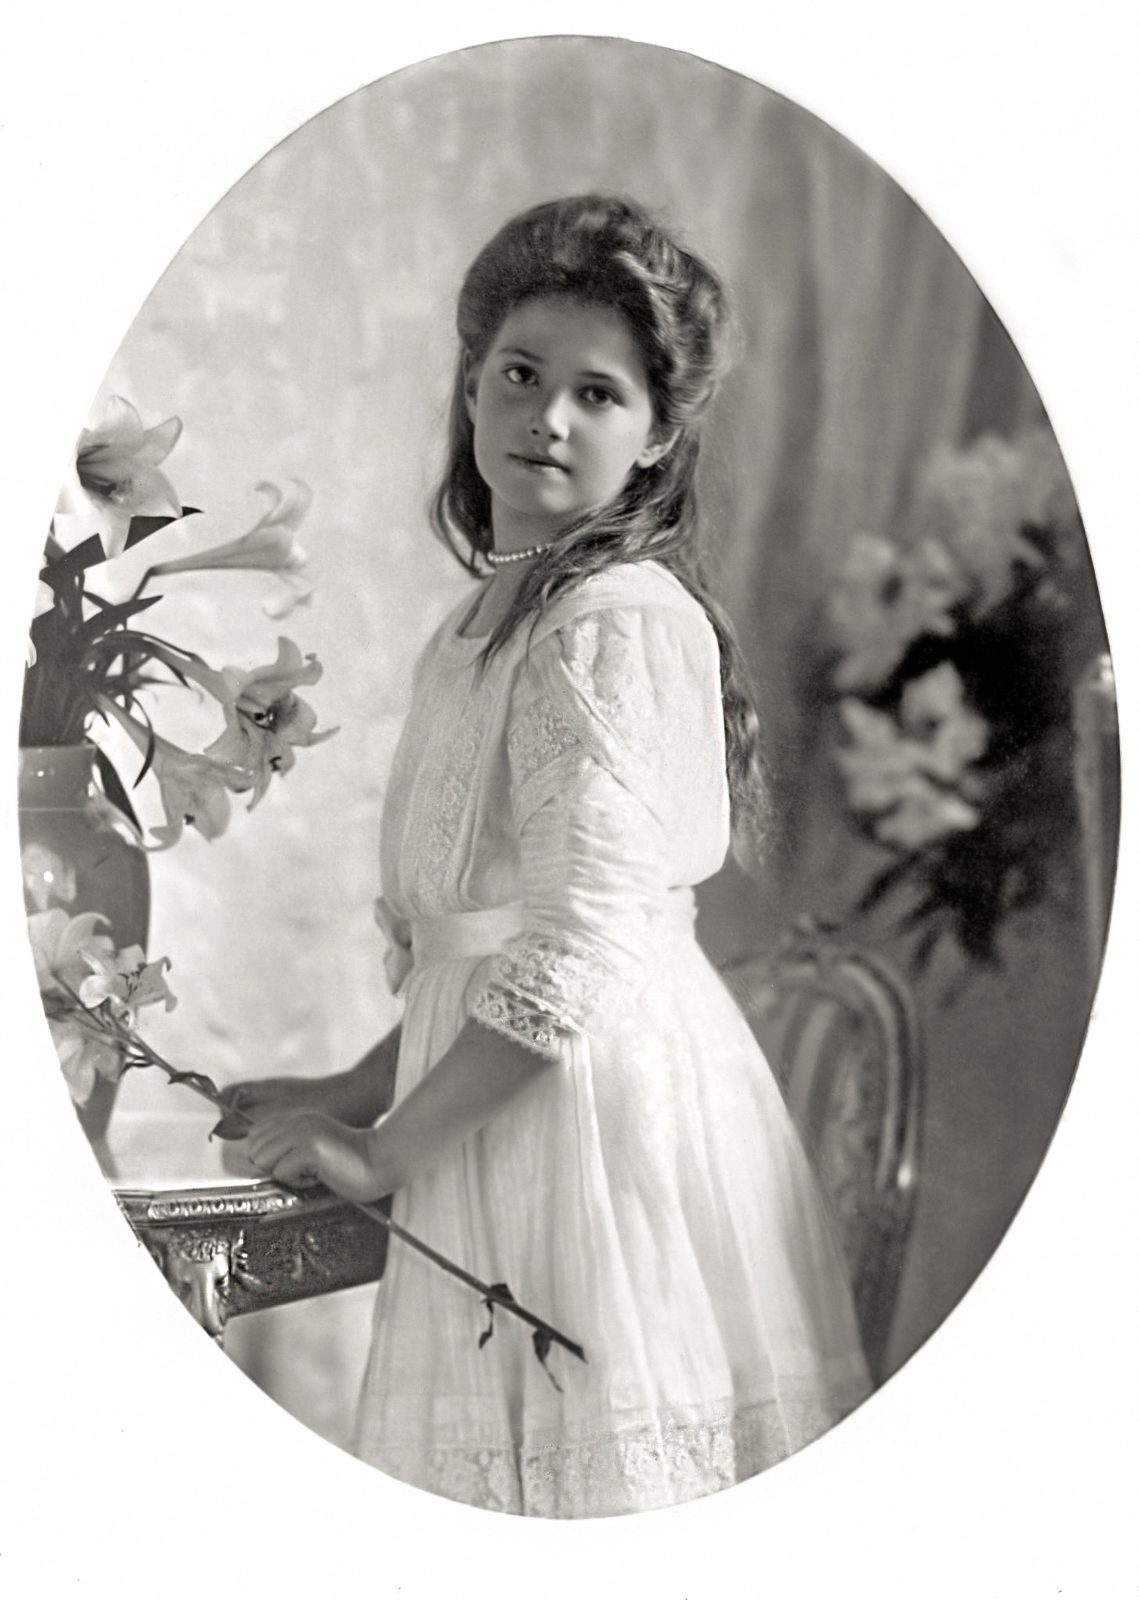 Grand Duchess Maria Nicholaevna with flowers.